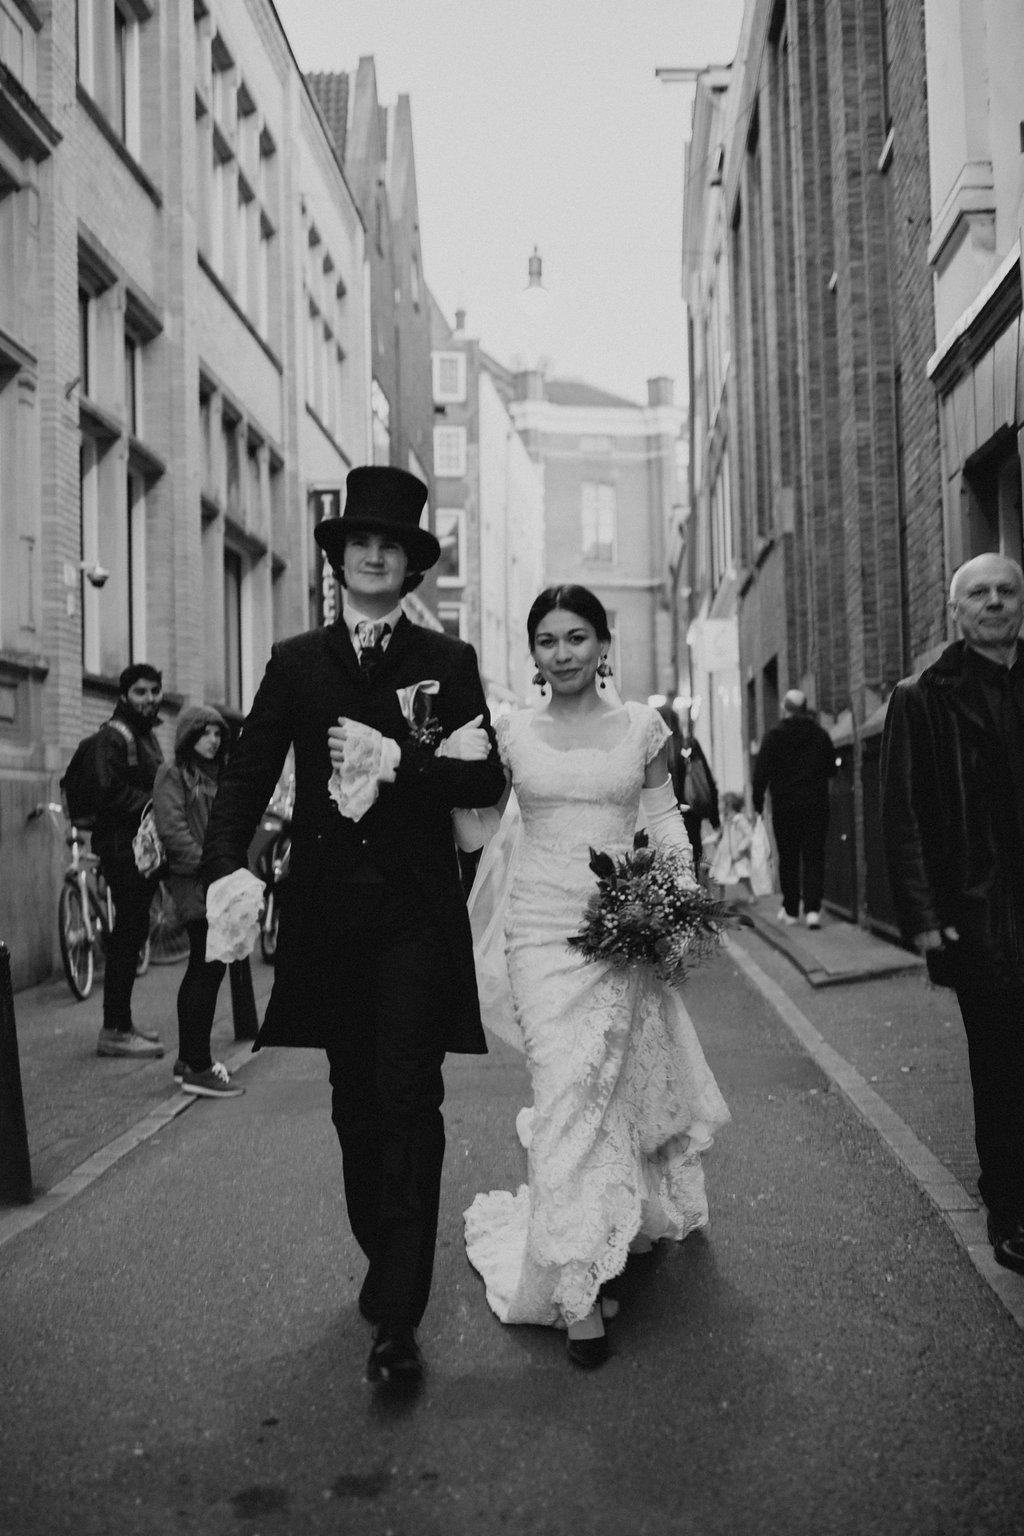 309-sjoerdbooijphotography-wedding-coen-janaina.jpg